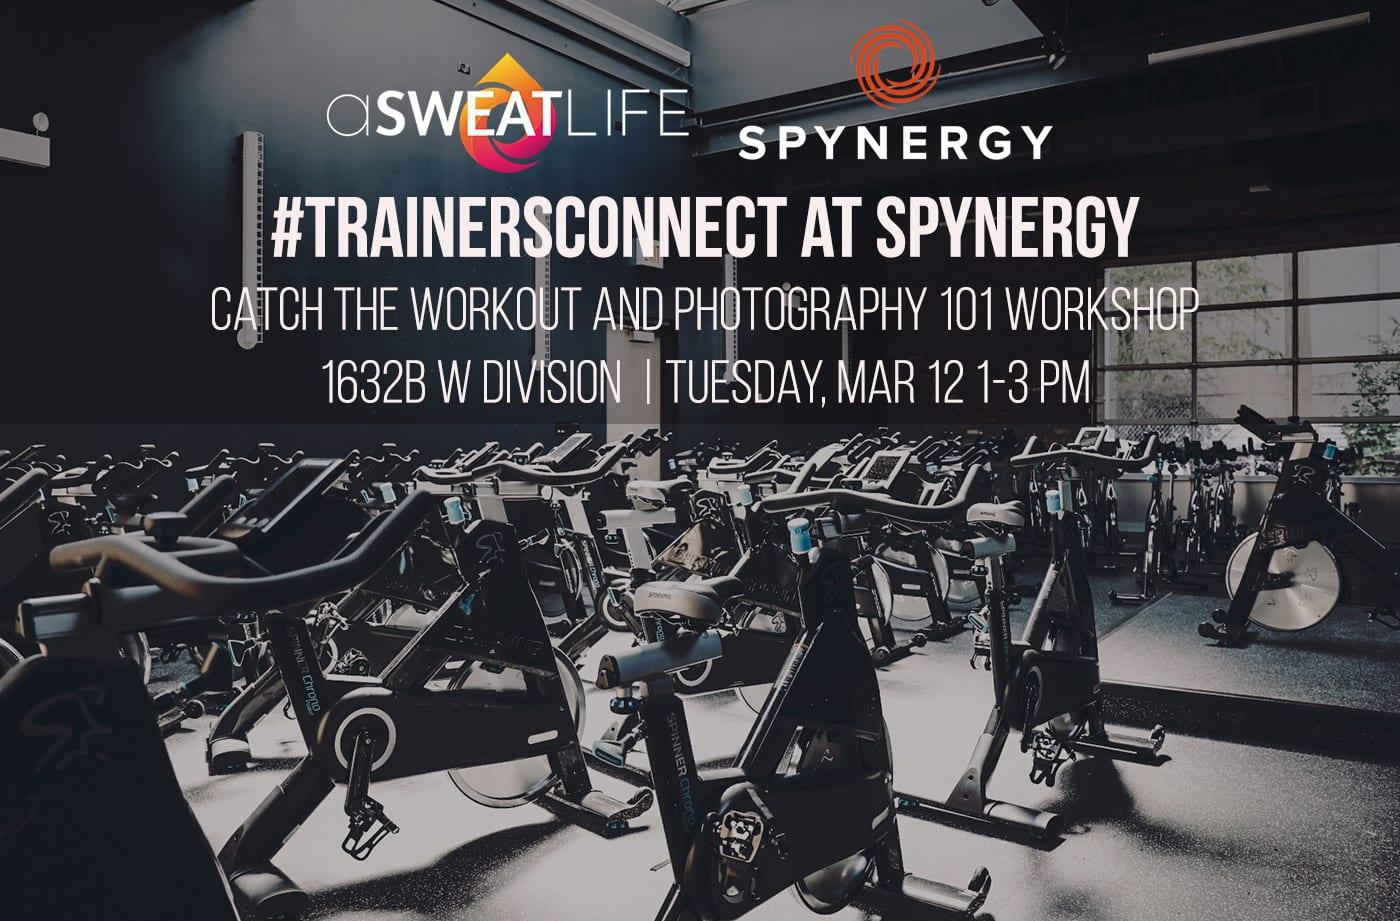 #TrainersConnect workshop